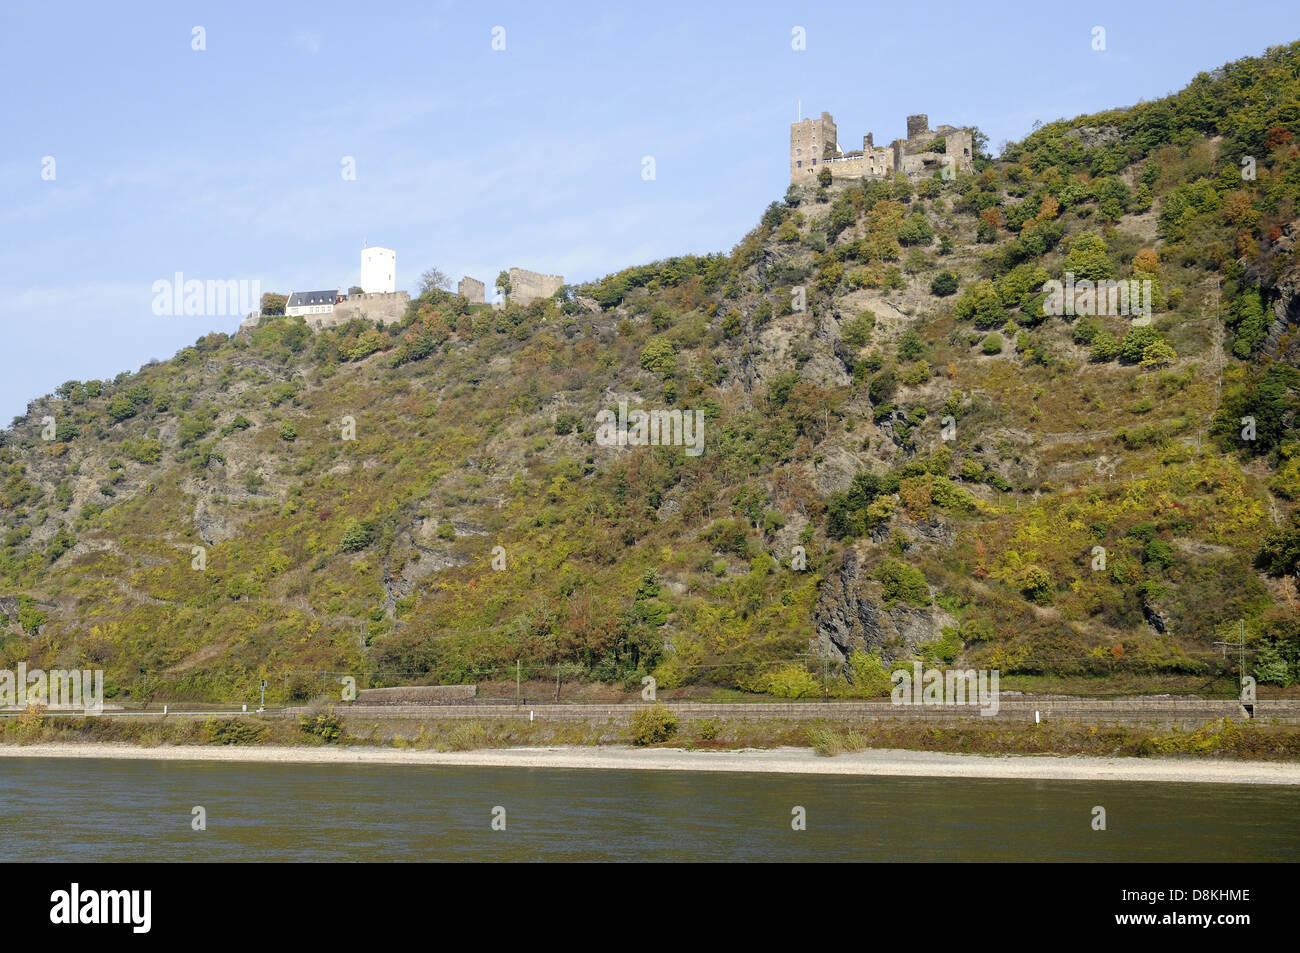 Fluss Rhein - Stock Image